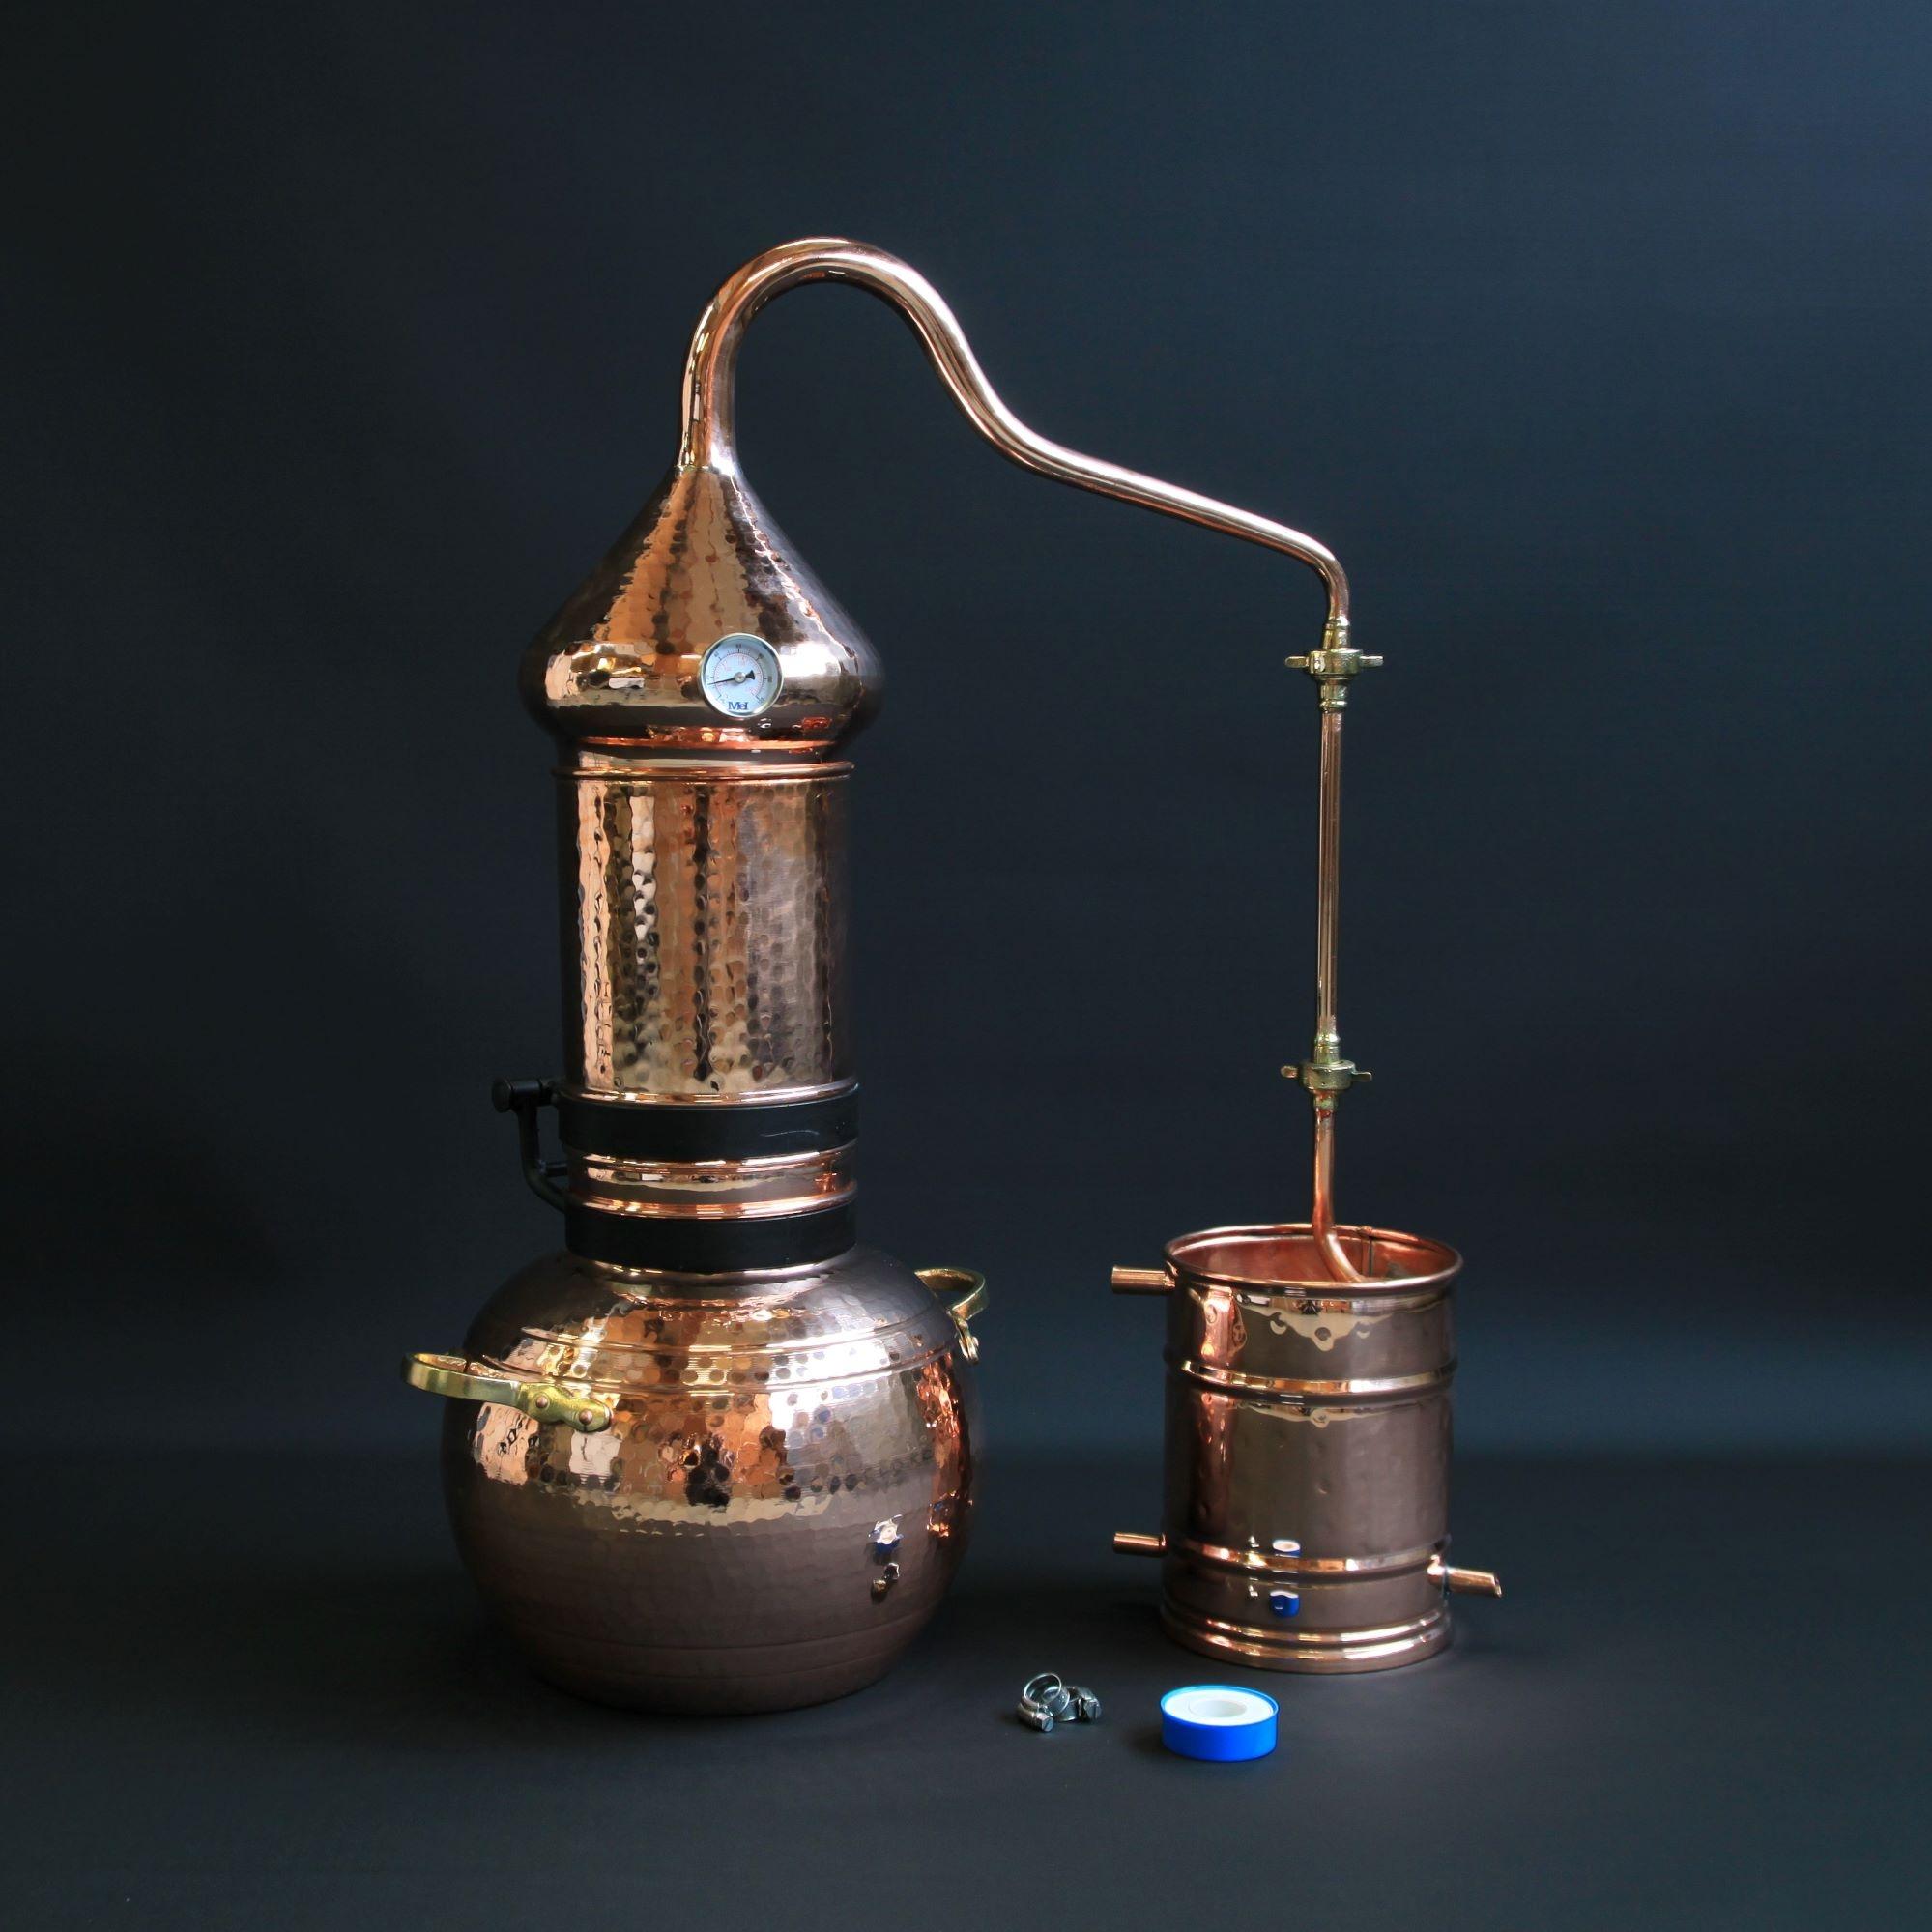 Roodkoperen Kolom Distilleerketel | drank stoken